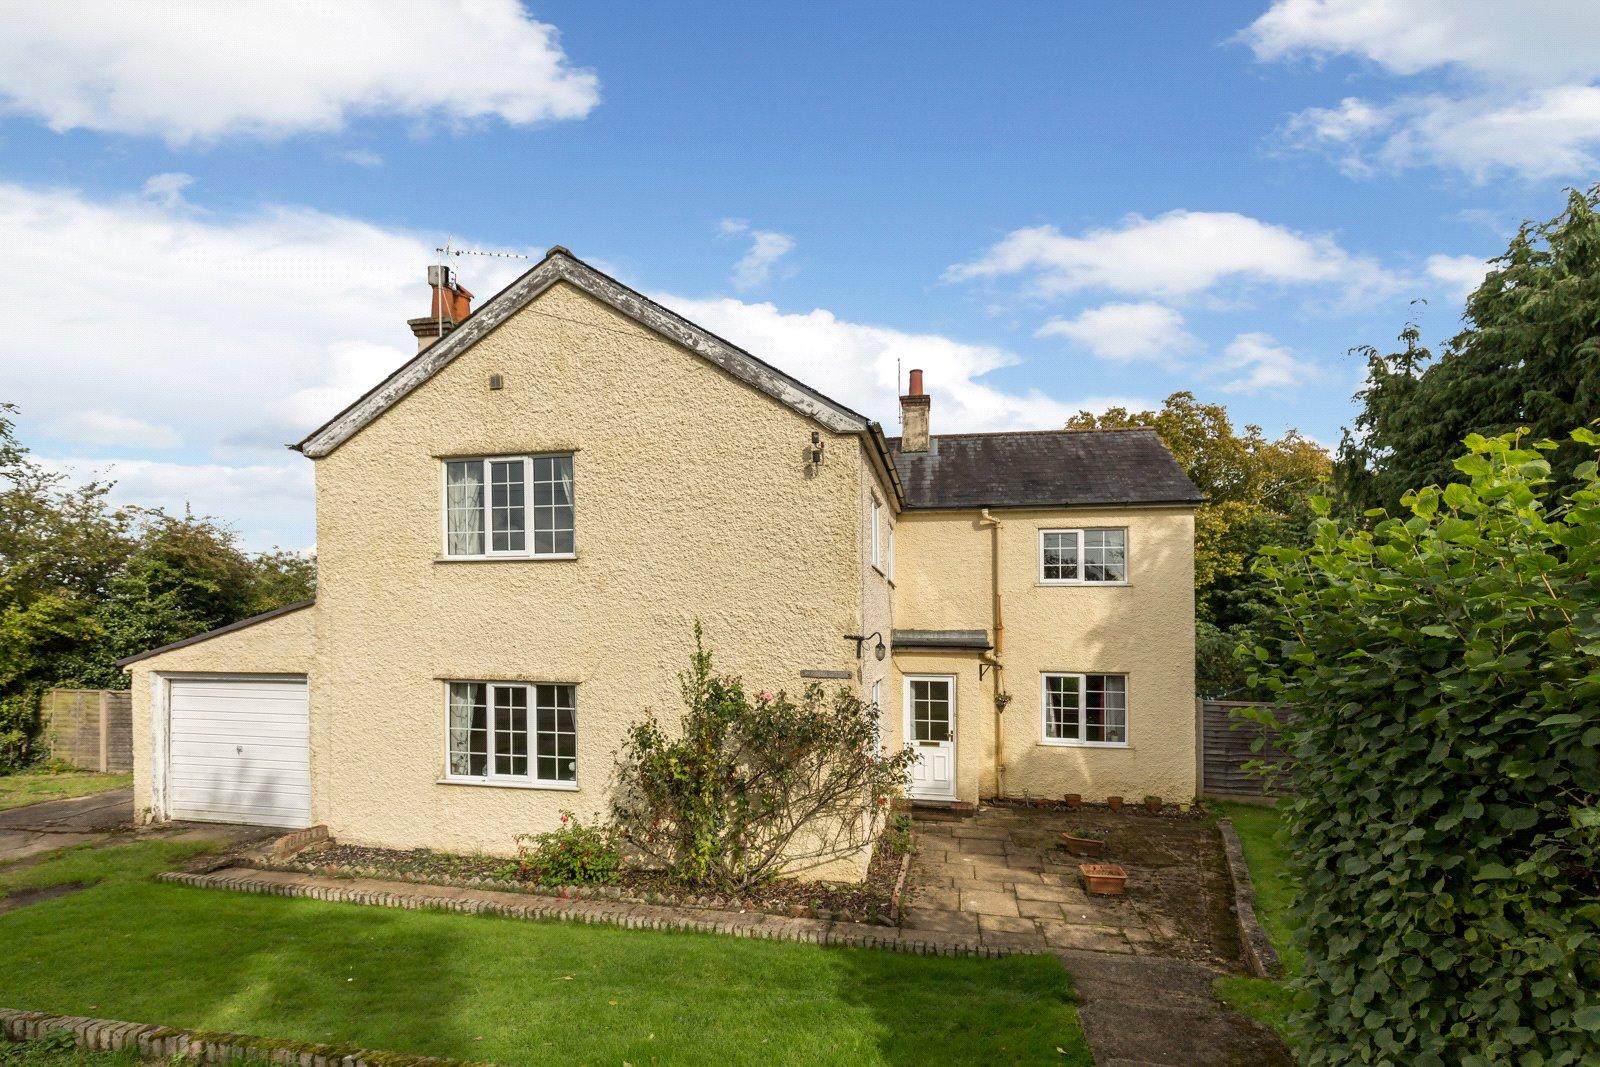 5 Bedrooms Detached House for sale in Wood End, Medmenham, Marlow, Buckinghamshire, SL7